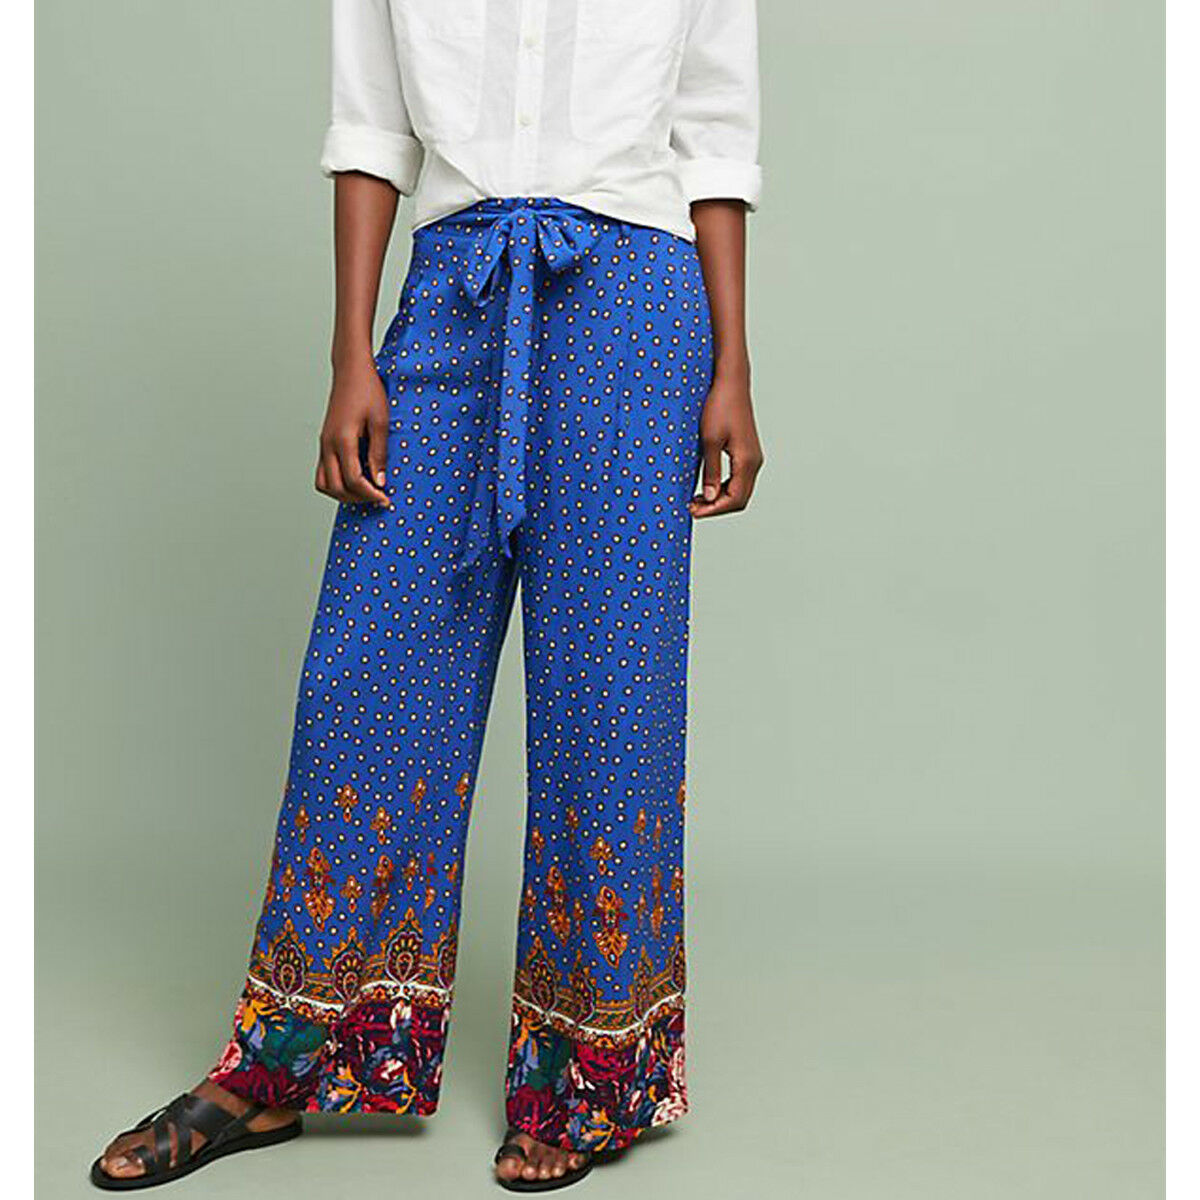 Anthropologie Ett Twa Printed Wide Leg Trousers Floral Pants Royal bluee NWT 14